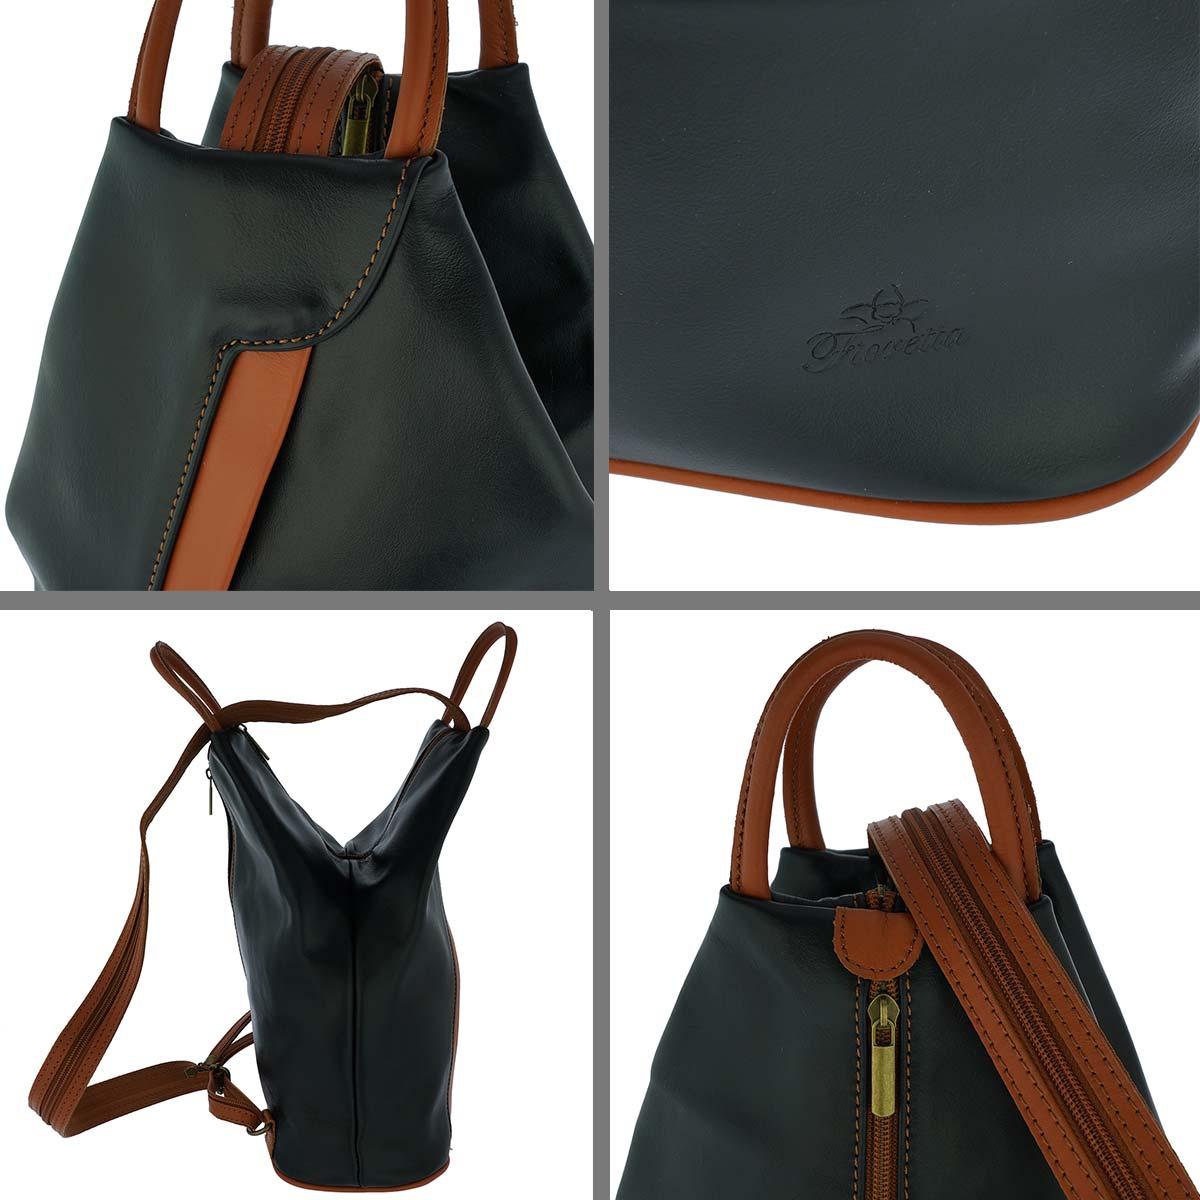 Fioretta Italian Genuine Leather Top Handle Backpack Purse Shoulder Bag Handbag Rucksack For Women - Black Brown